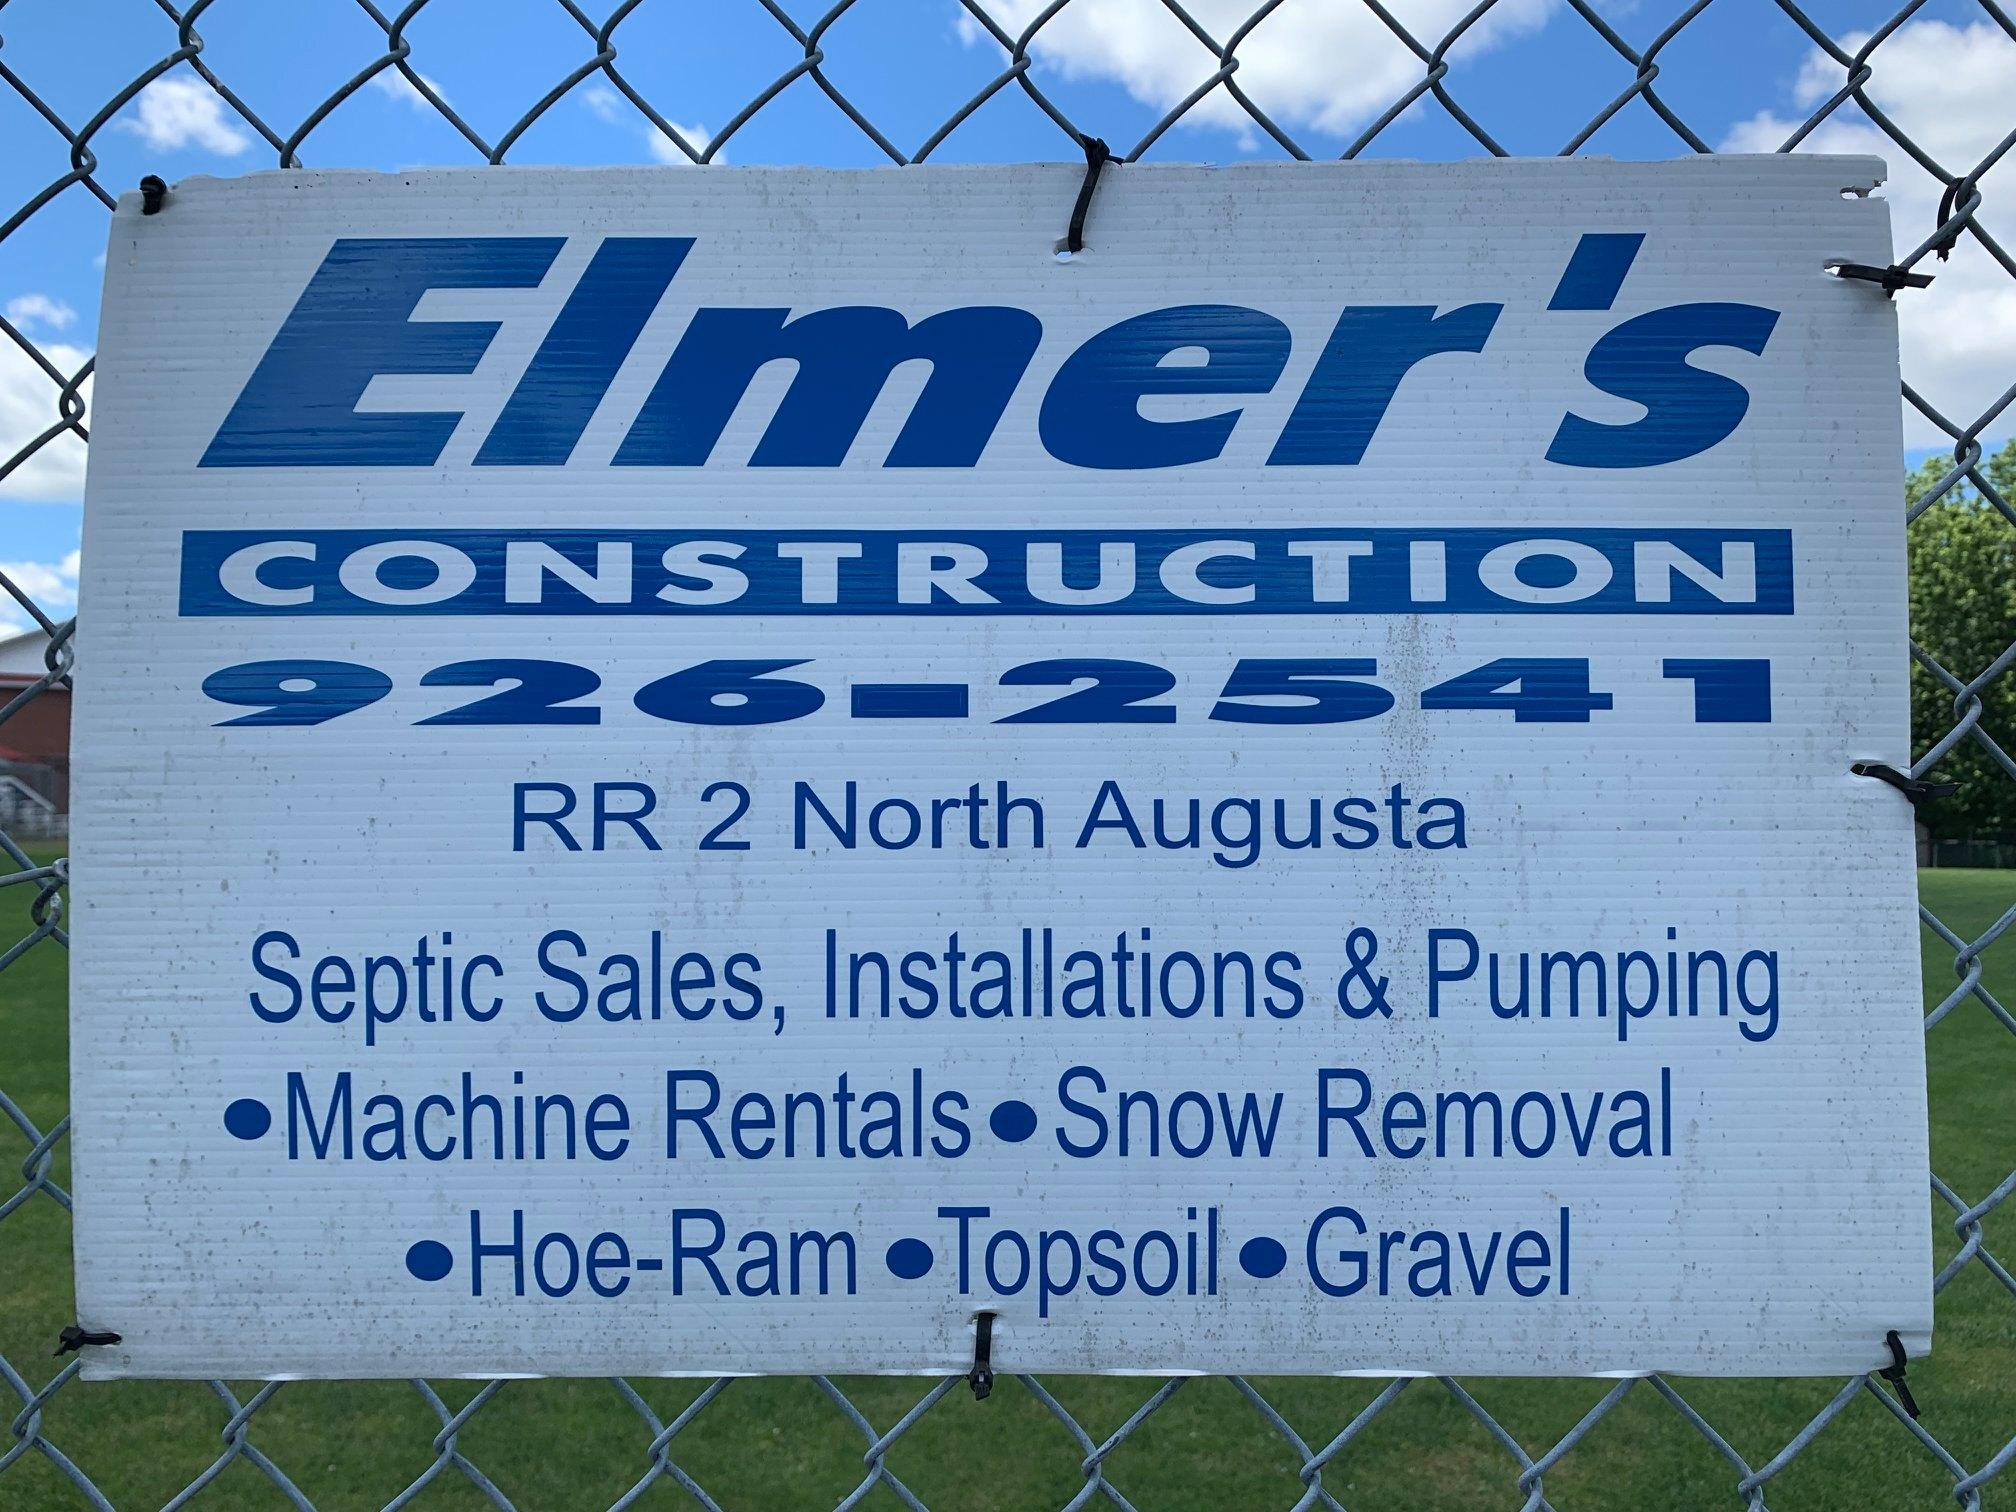 elmer's construction 926-2541 RR2 north augusta, septic sales, installations & pumping. Machine rentals, snow removal, hoe-ram, topsoil, gravel